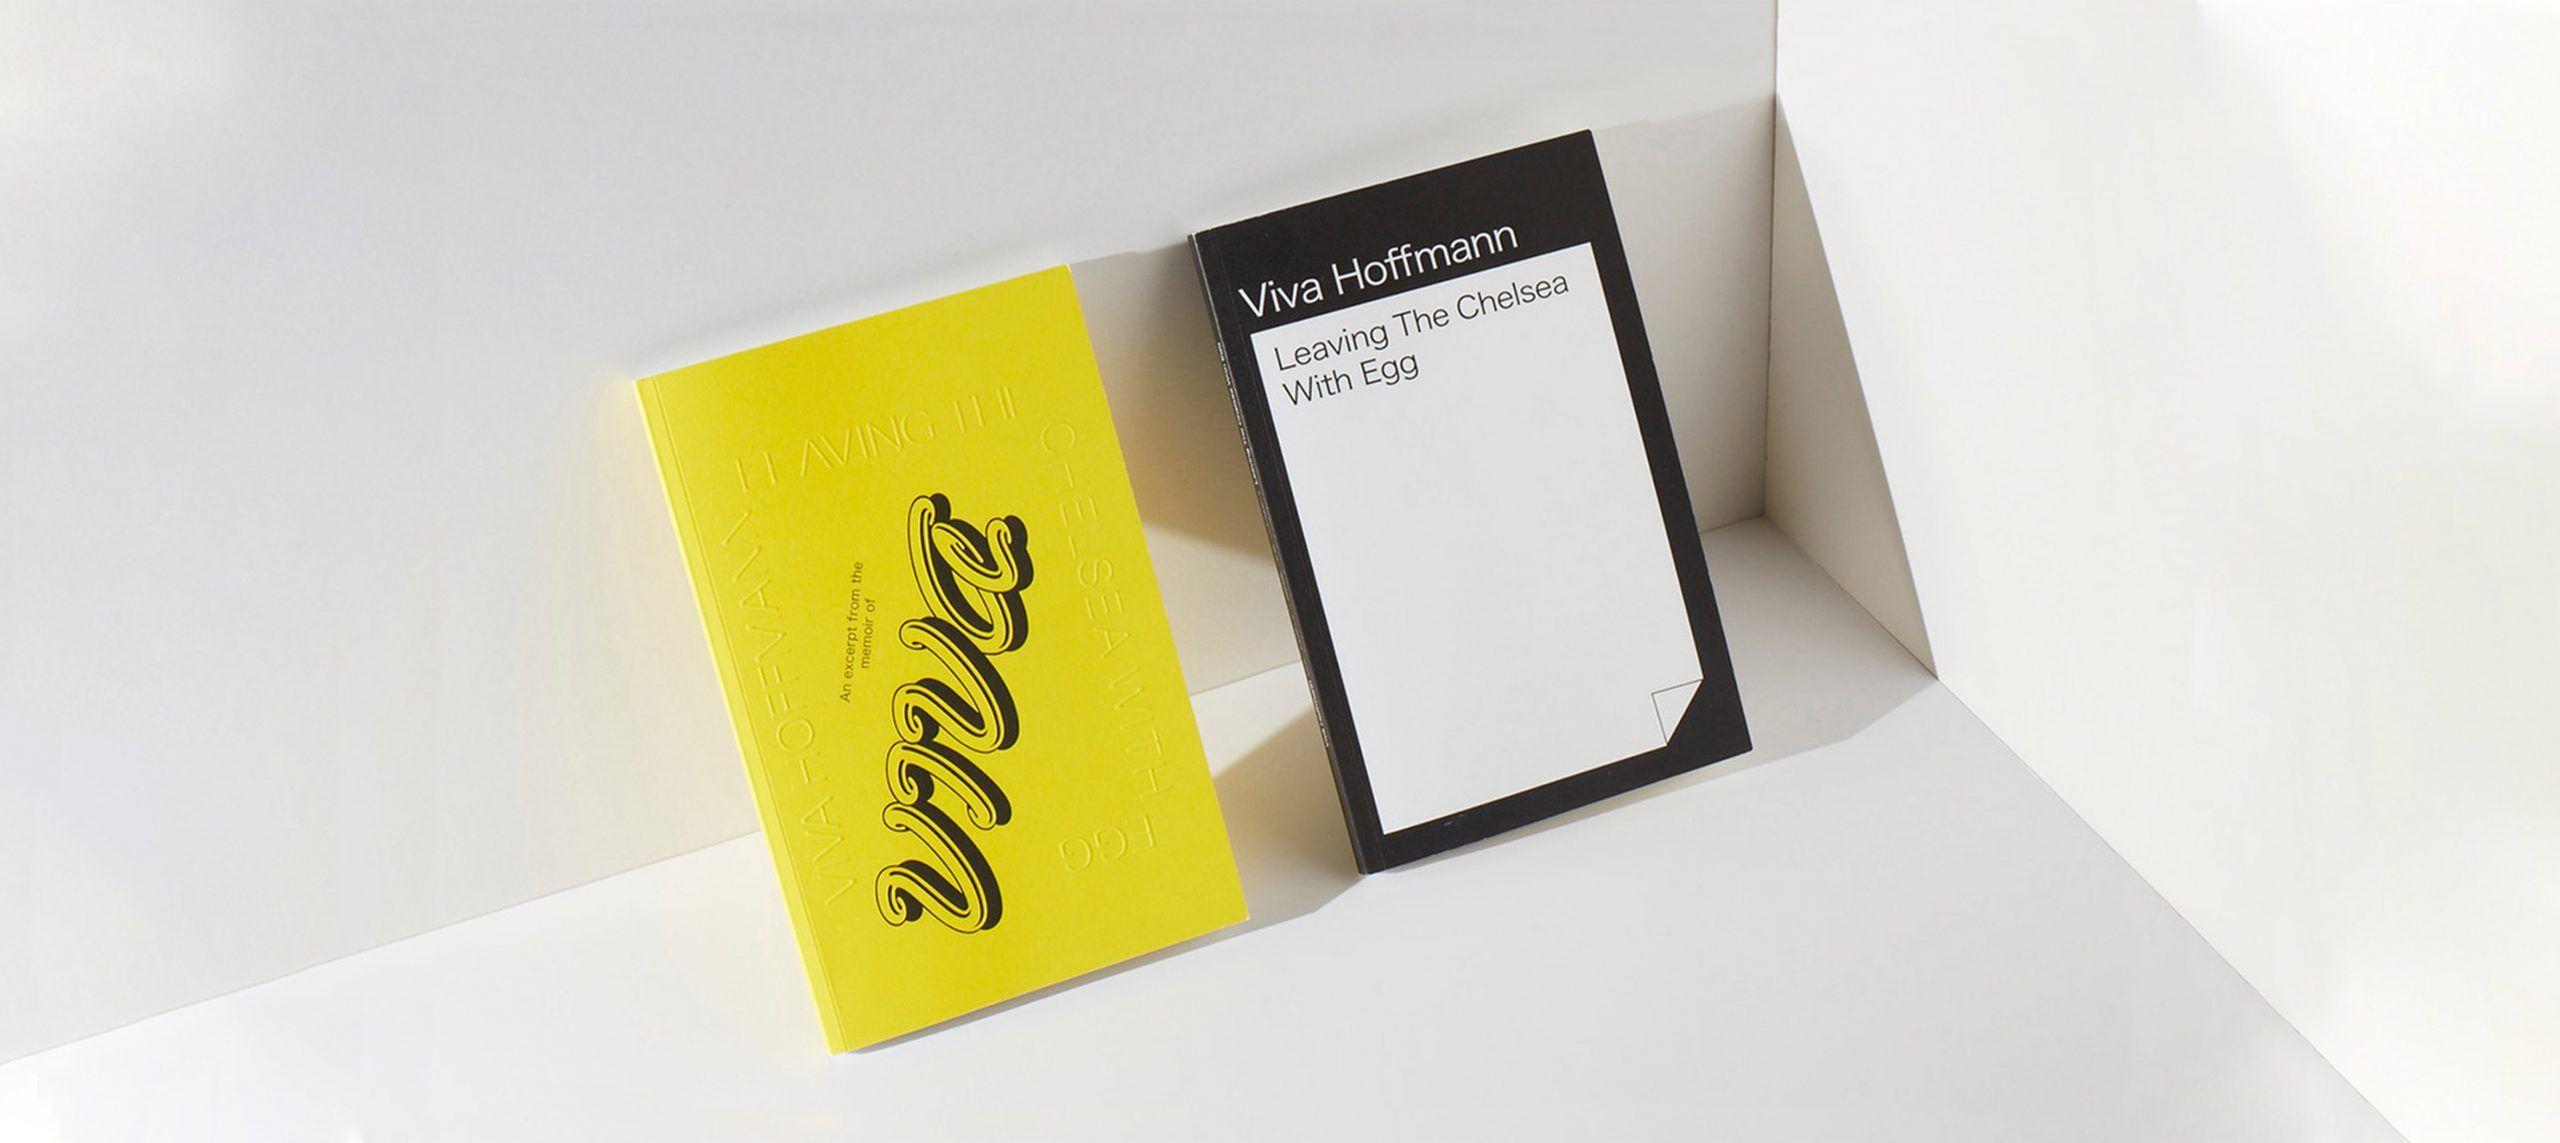 Studio Last - Leaving the Chelsea with Egg by Viva Hoffmann – Book